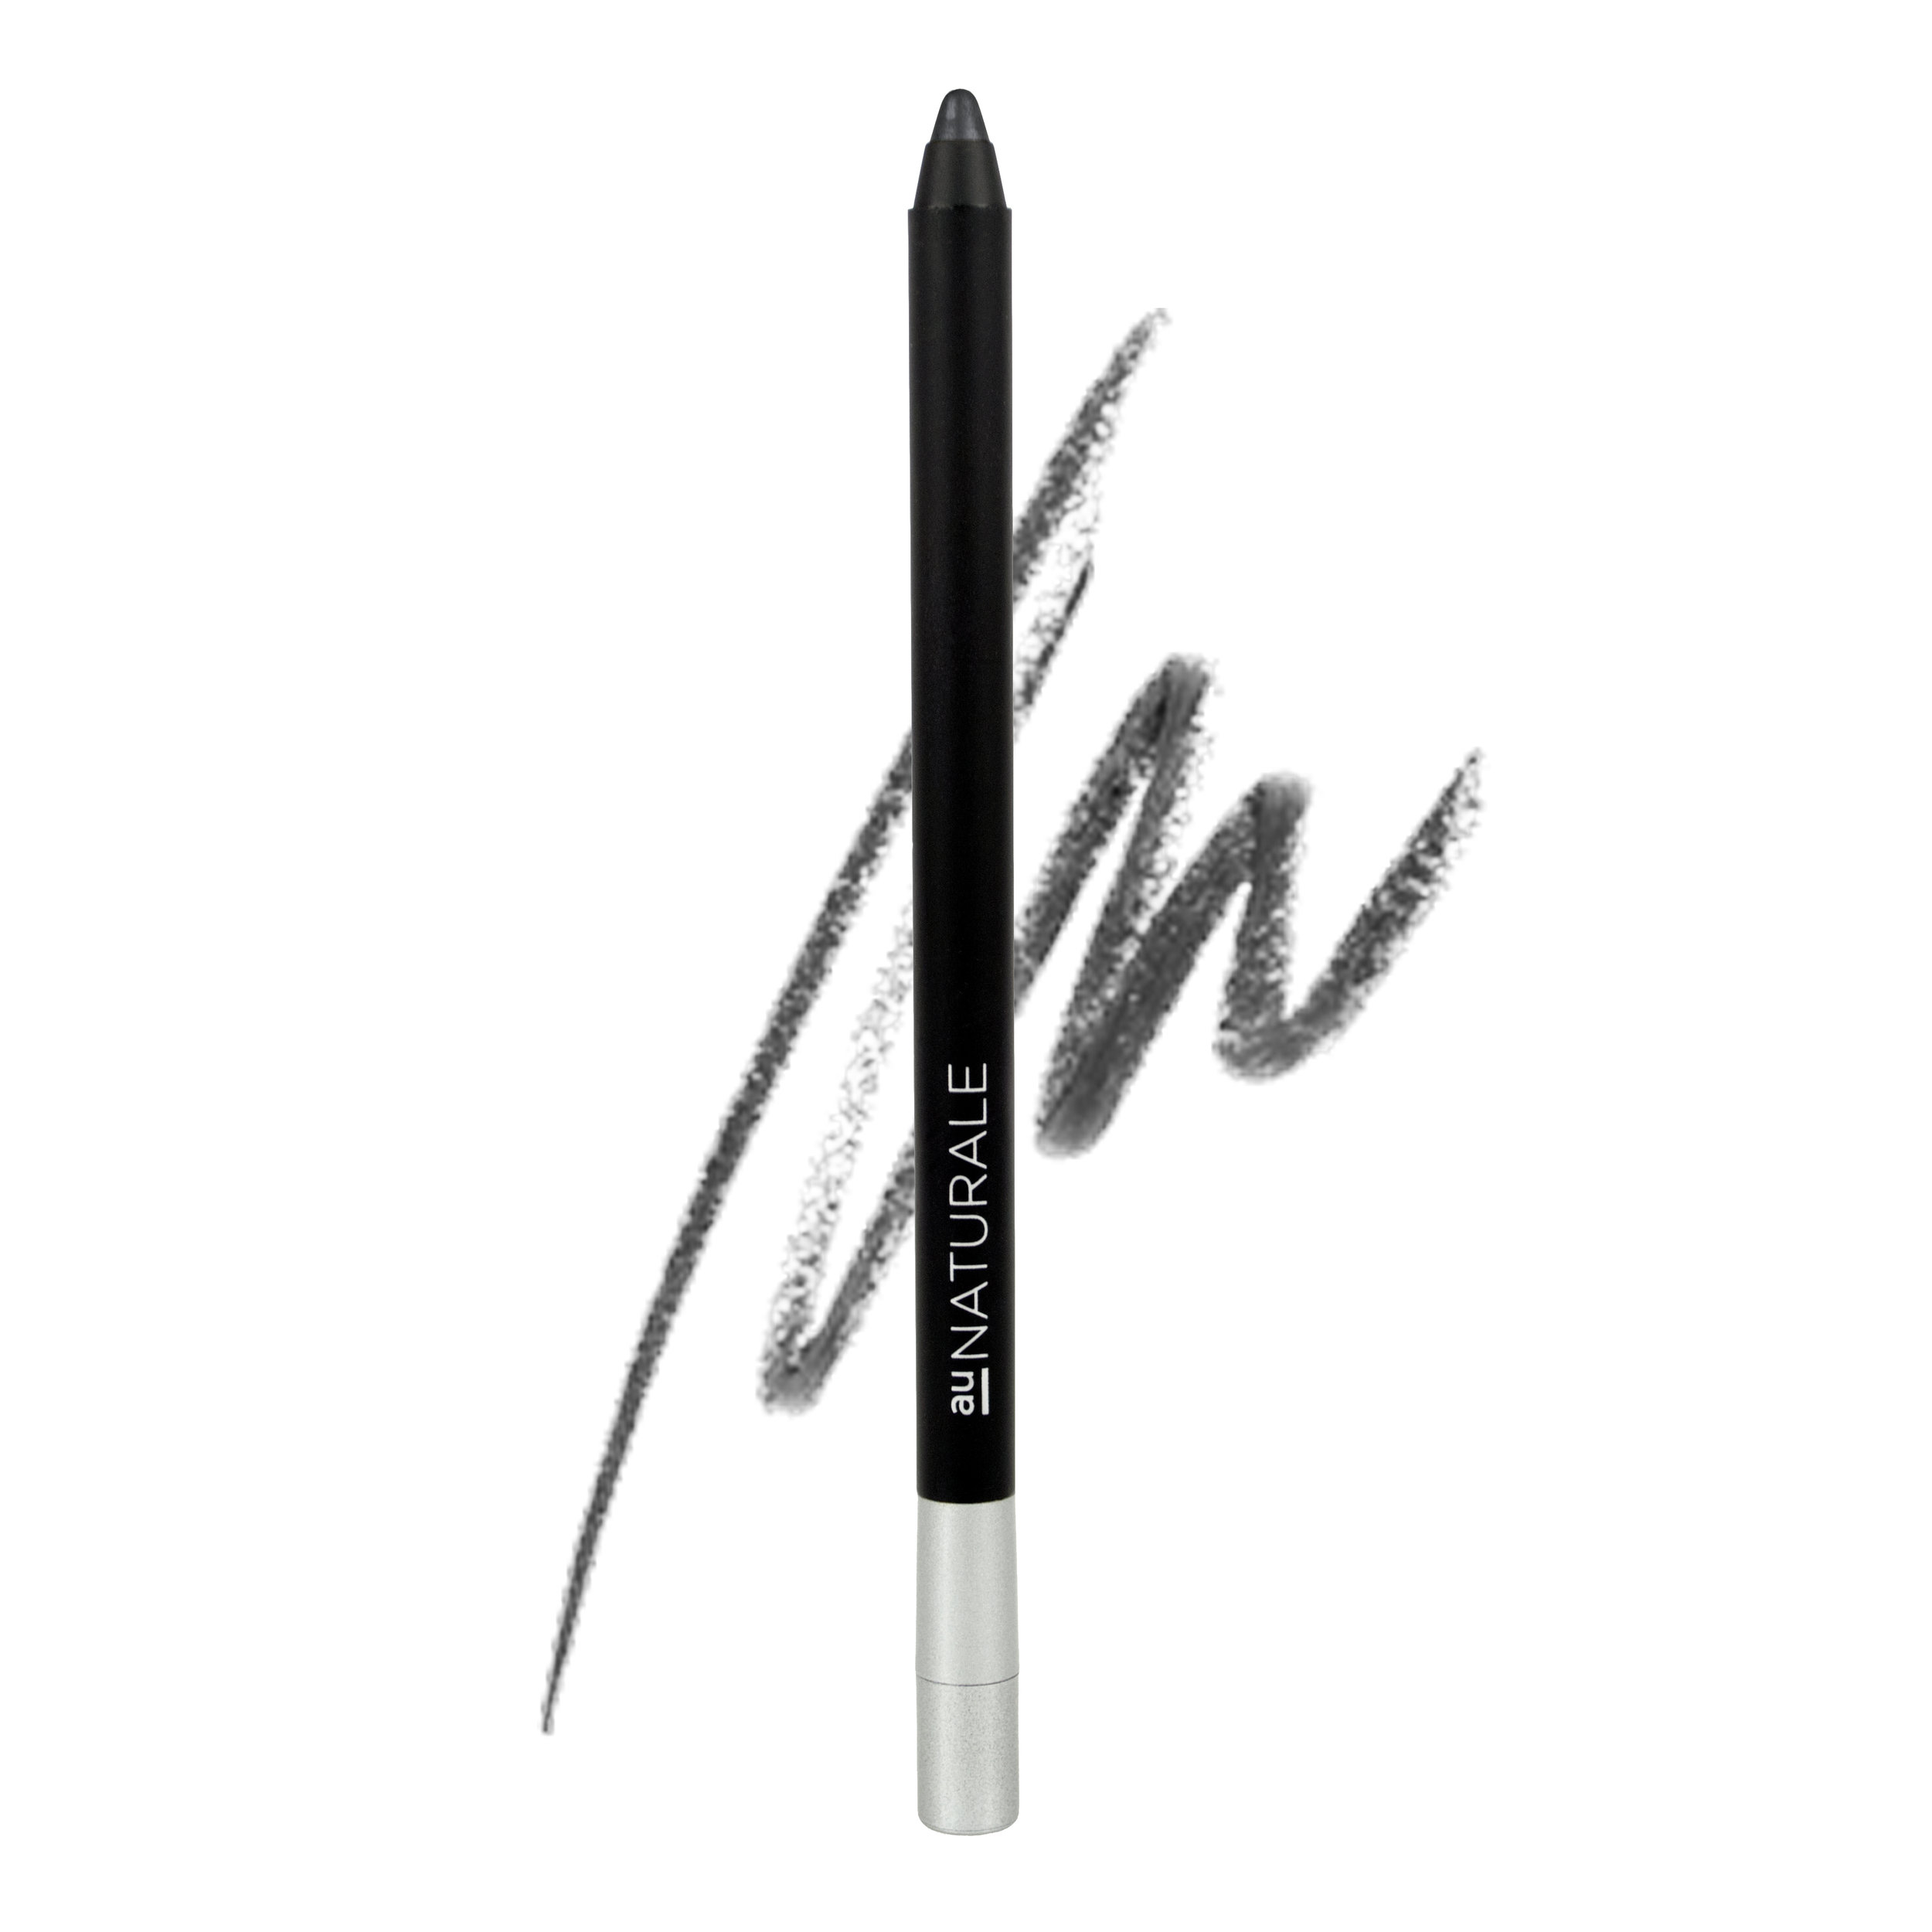 Graphite Swipe-On Essential Eye Pencil